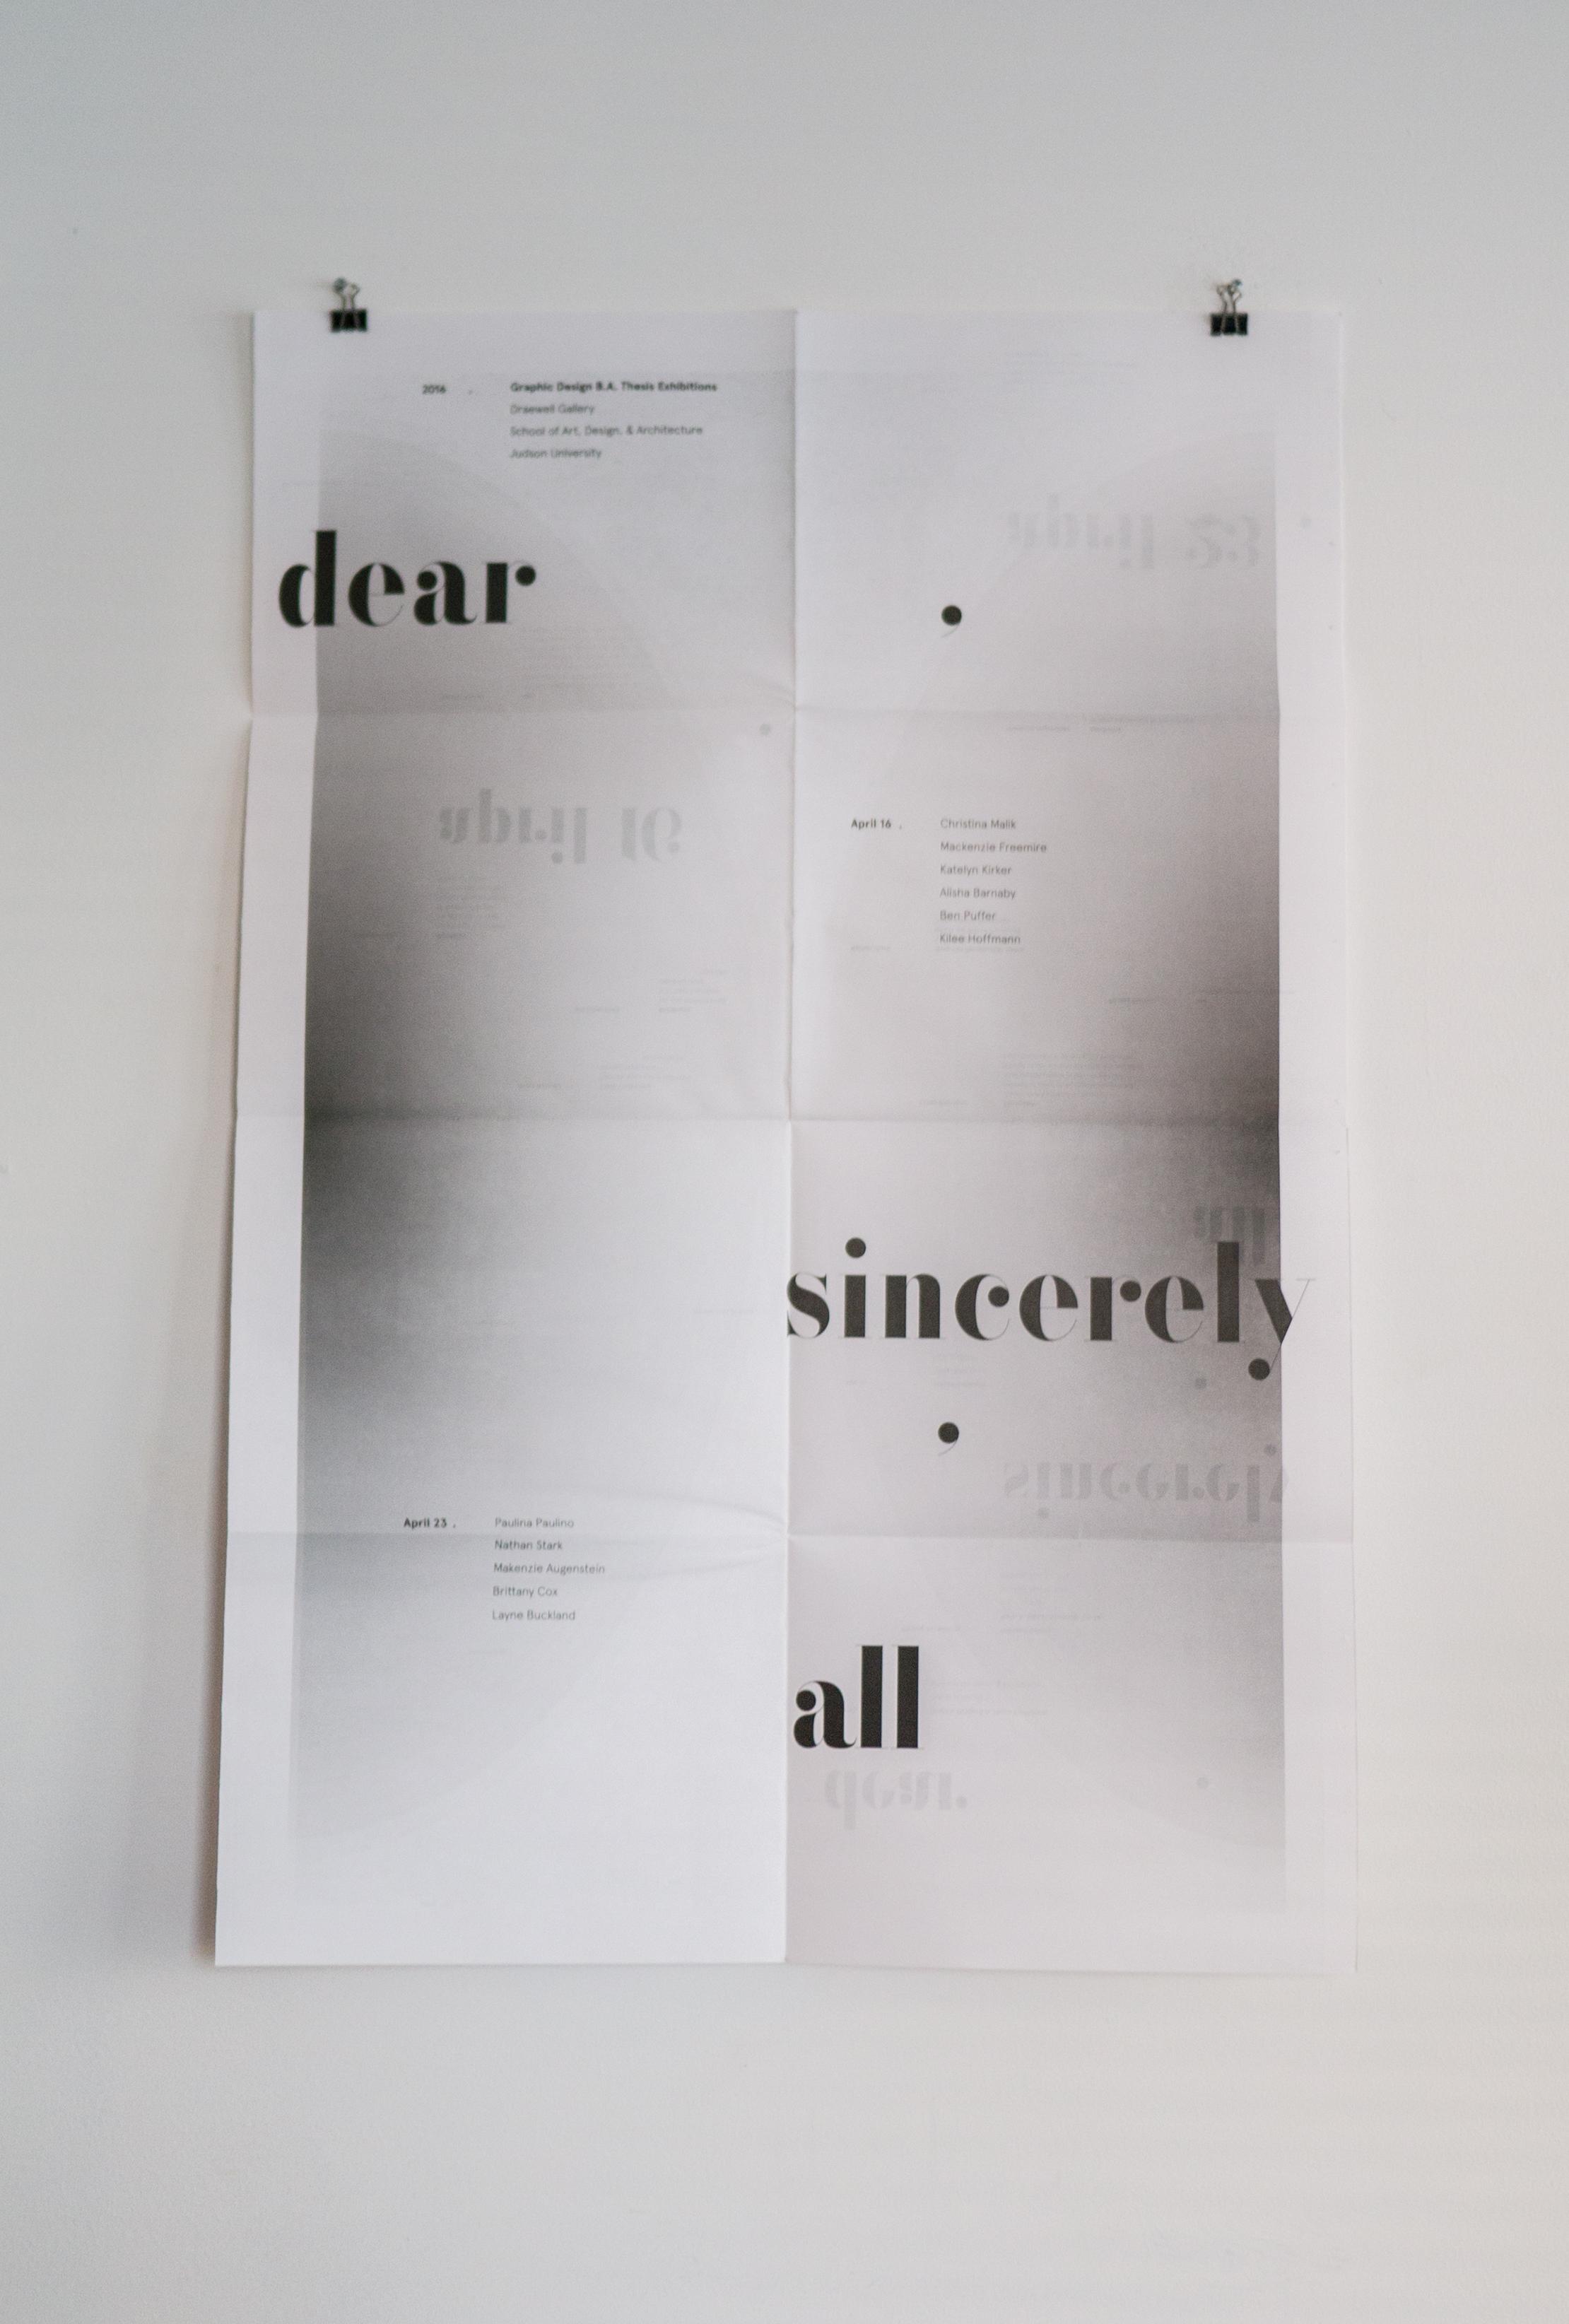 dearSincerely-9